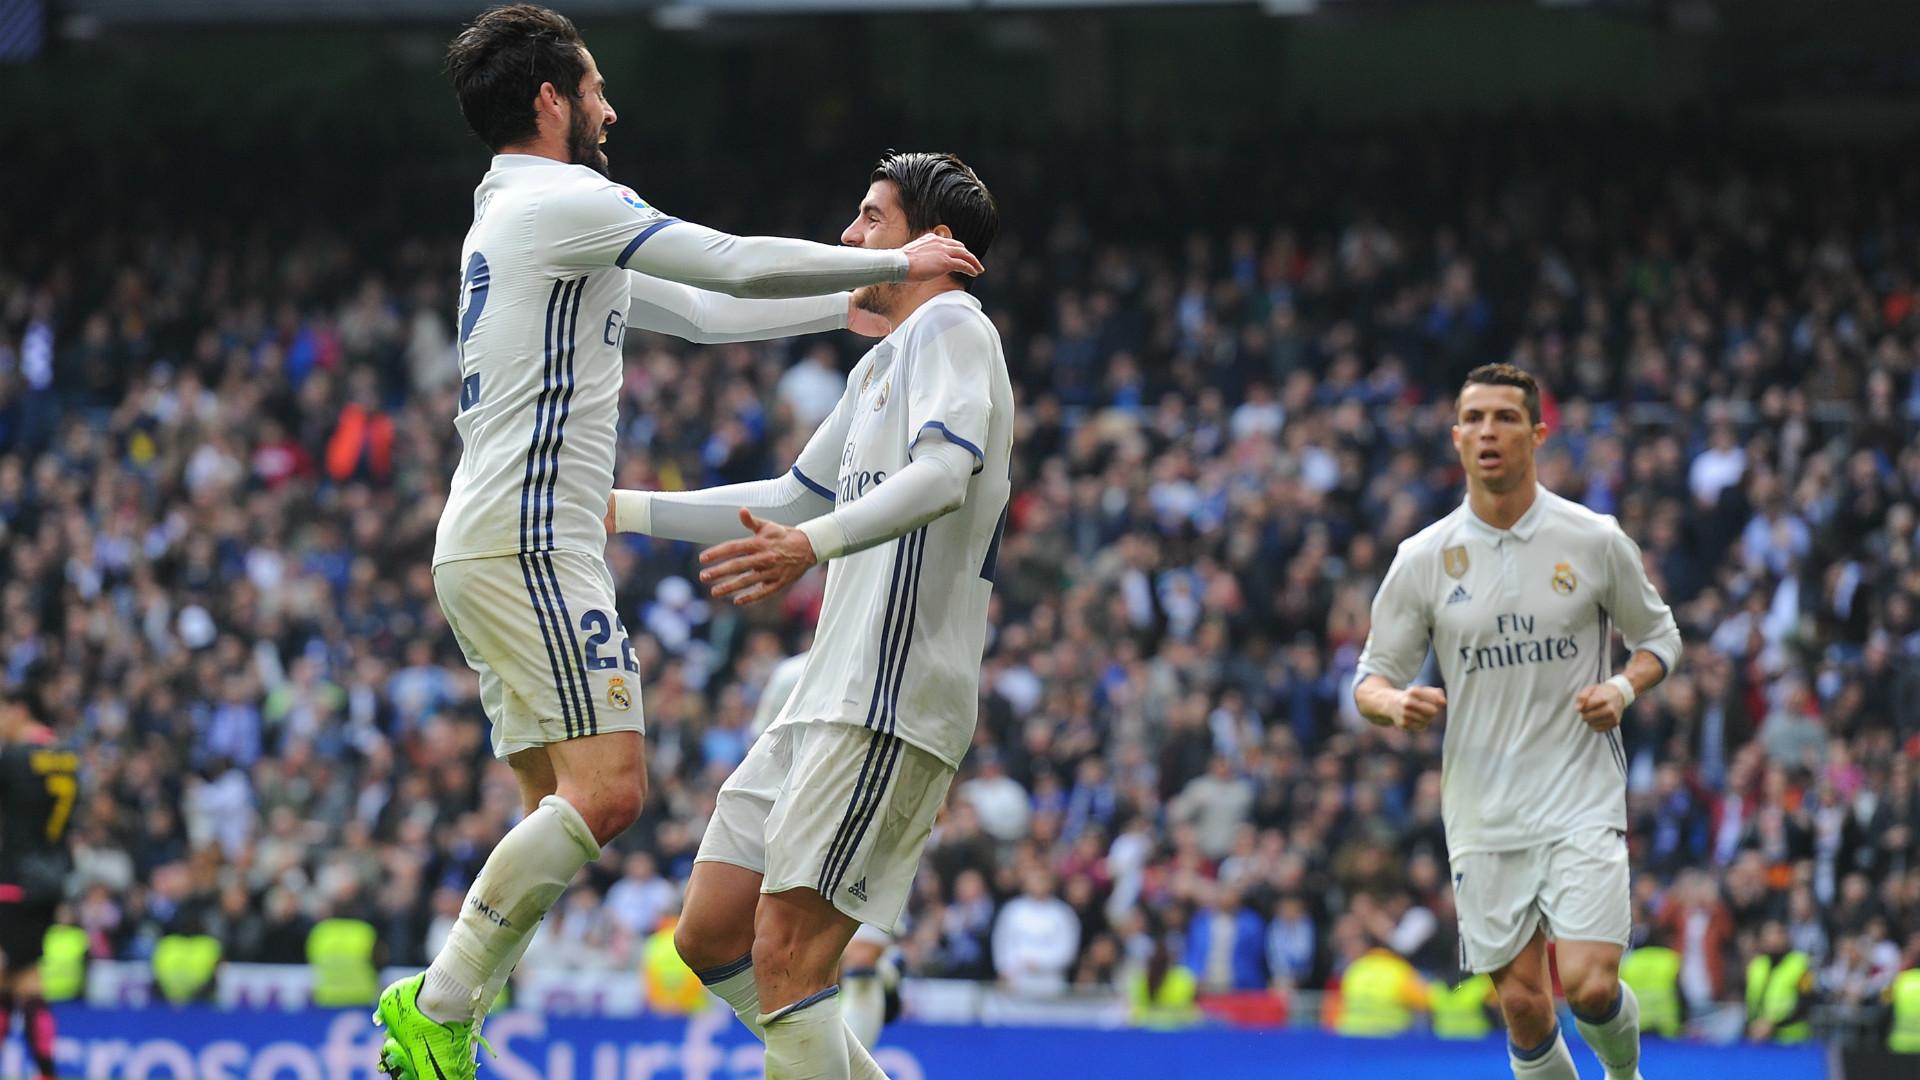 Alvaro Morata Isco Alarcon Real Madrid Espanyol LaLiga